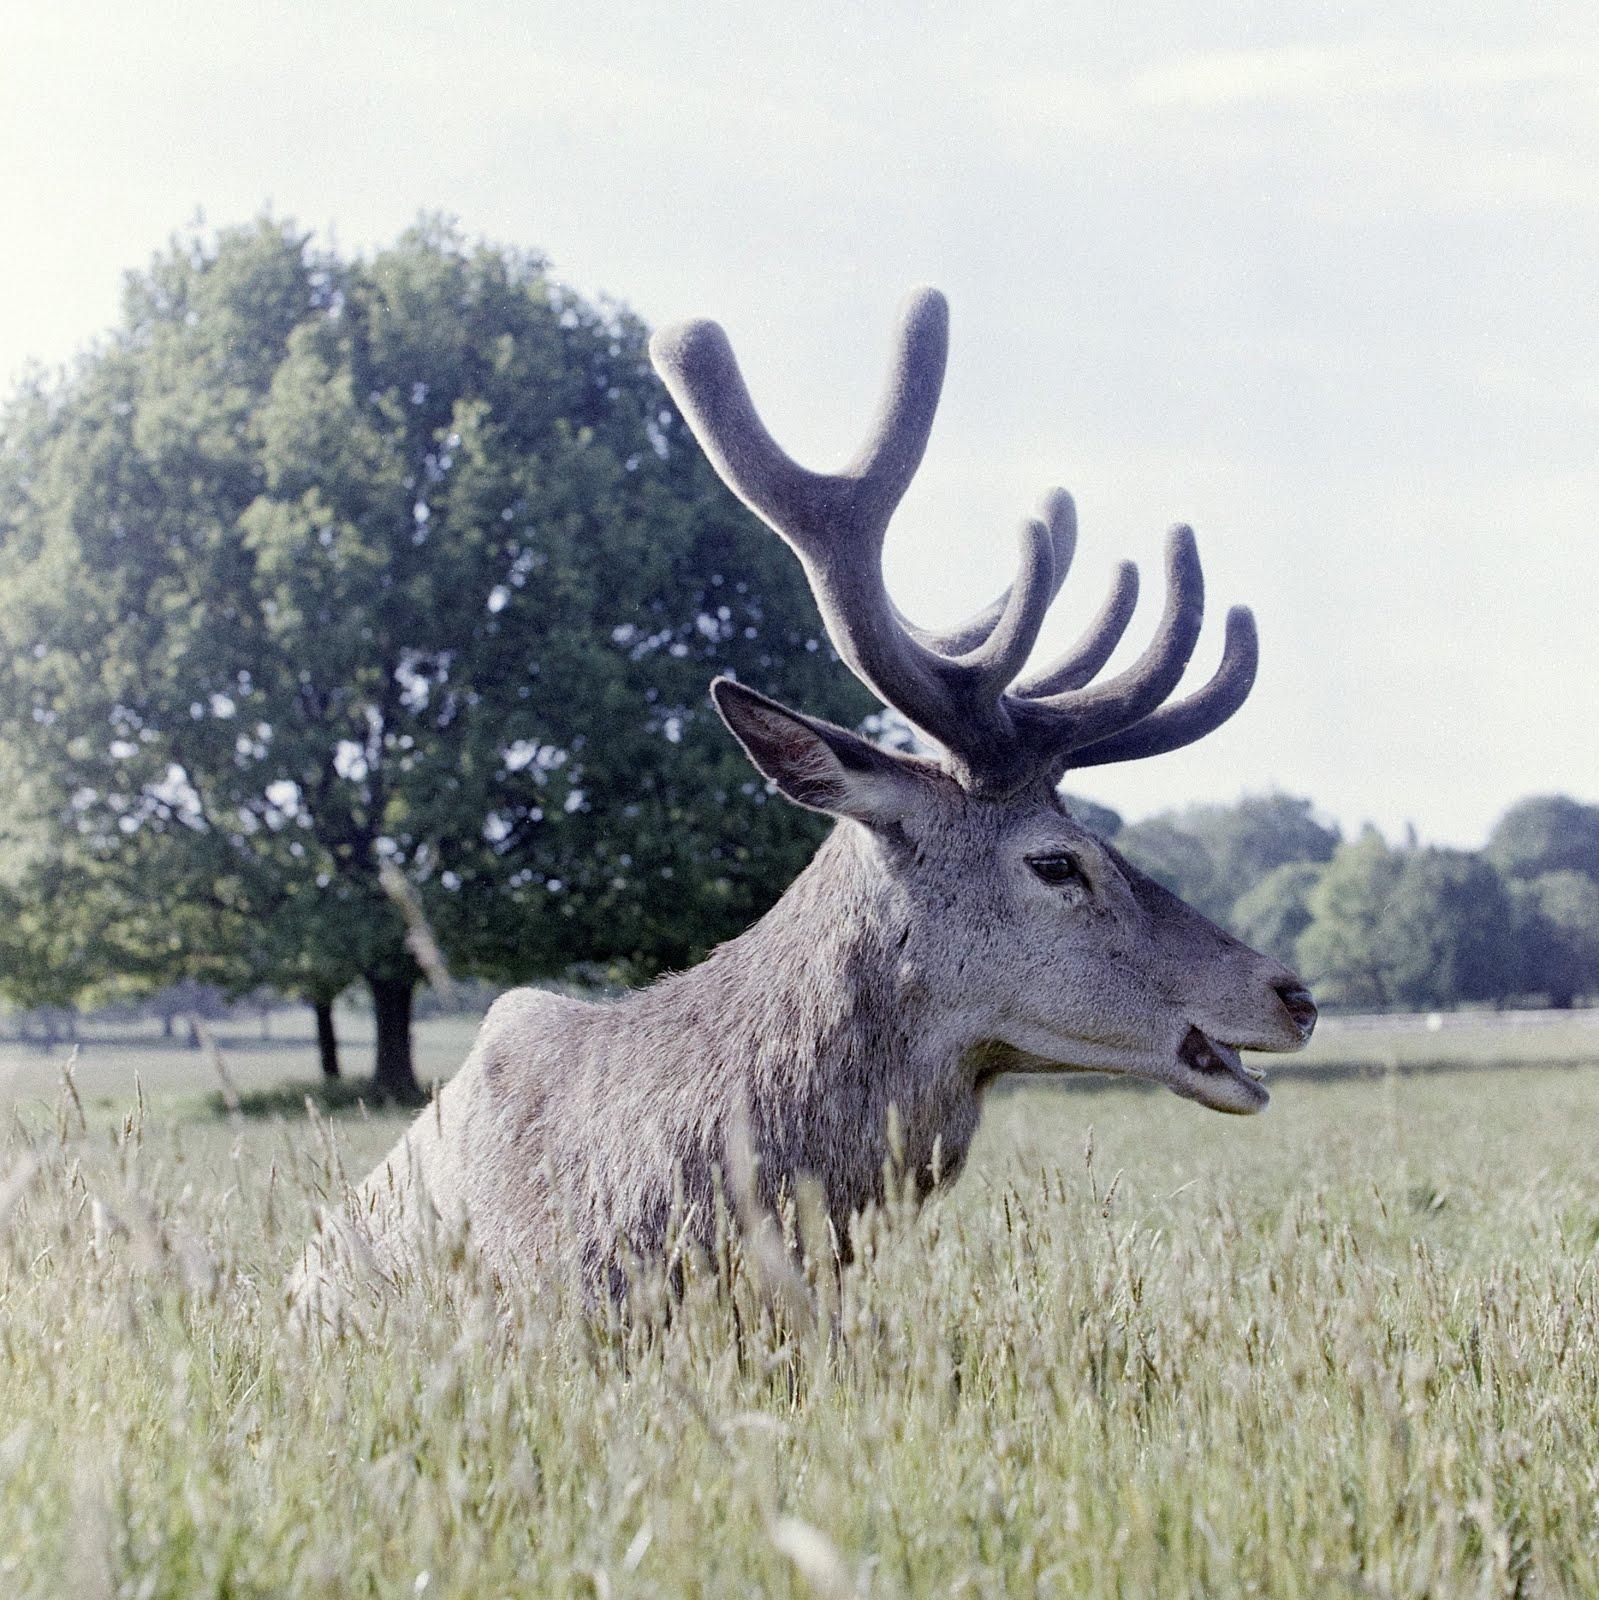 deer taken with lomochrome metropolis 120 film